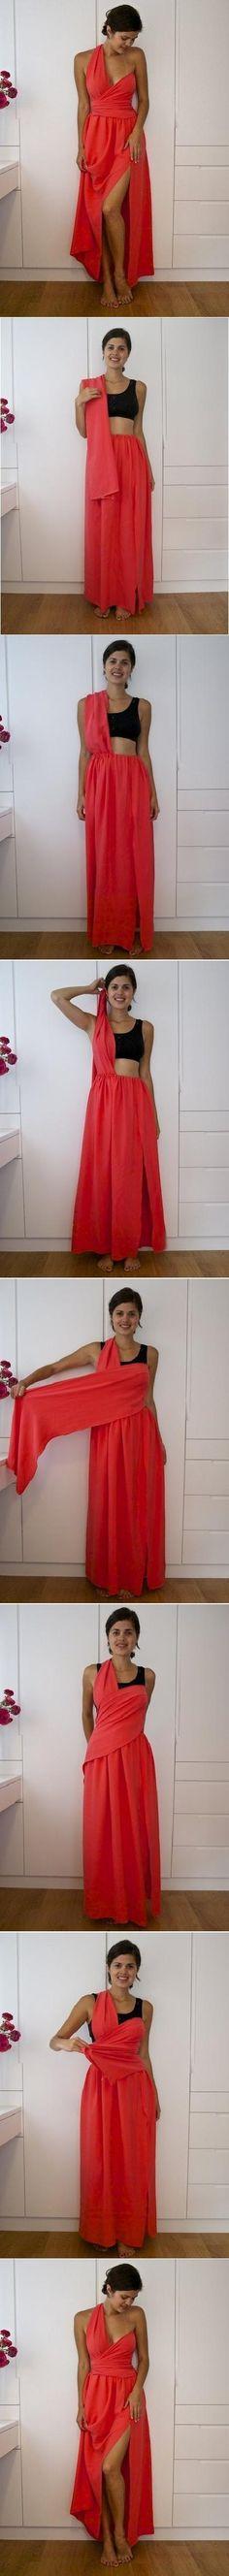 DIY No Sew WrapDress